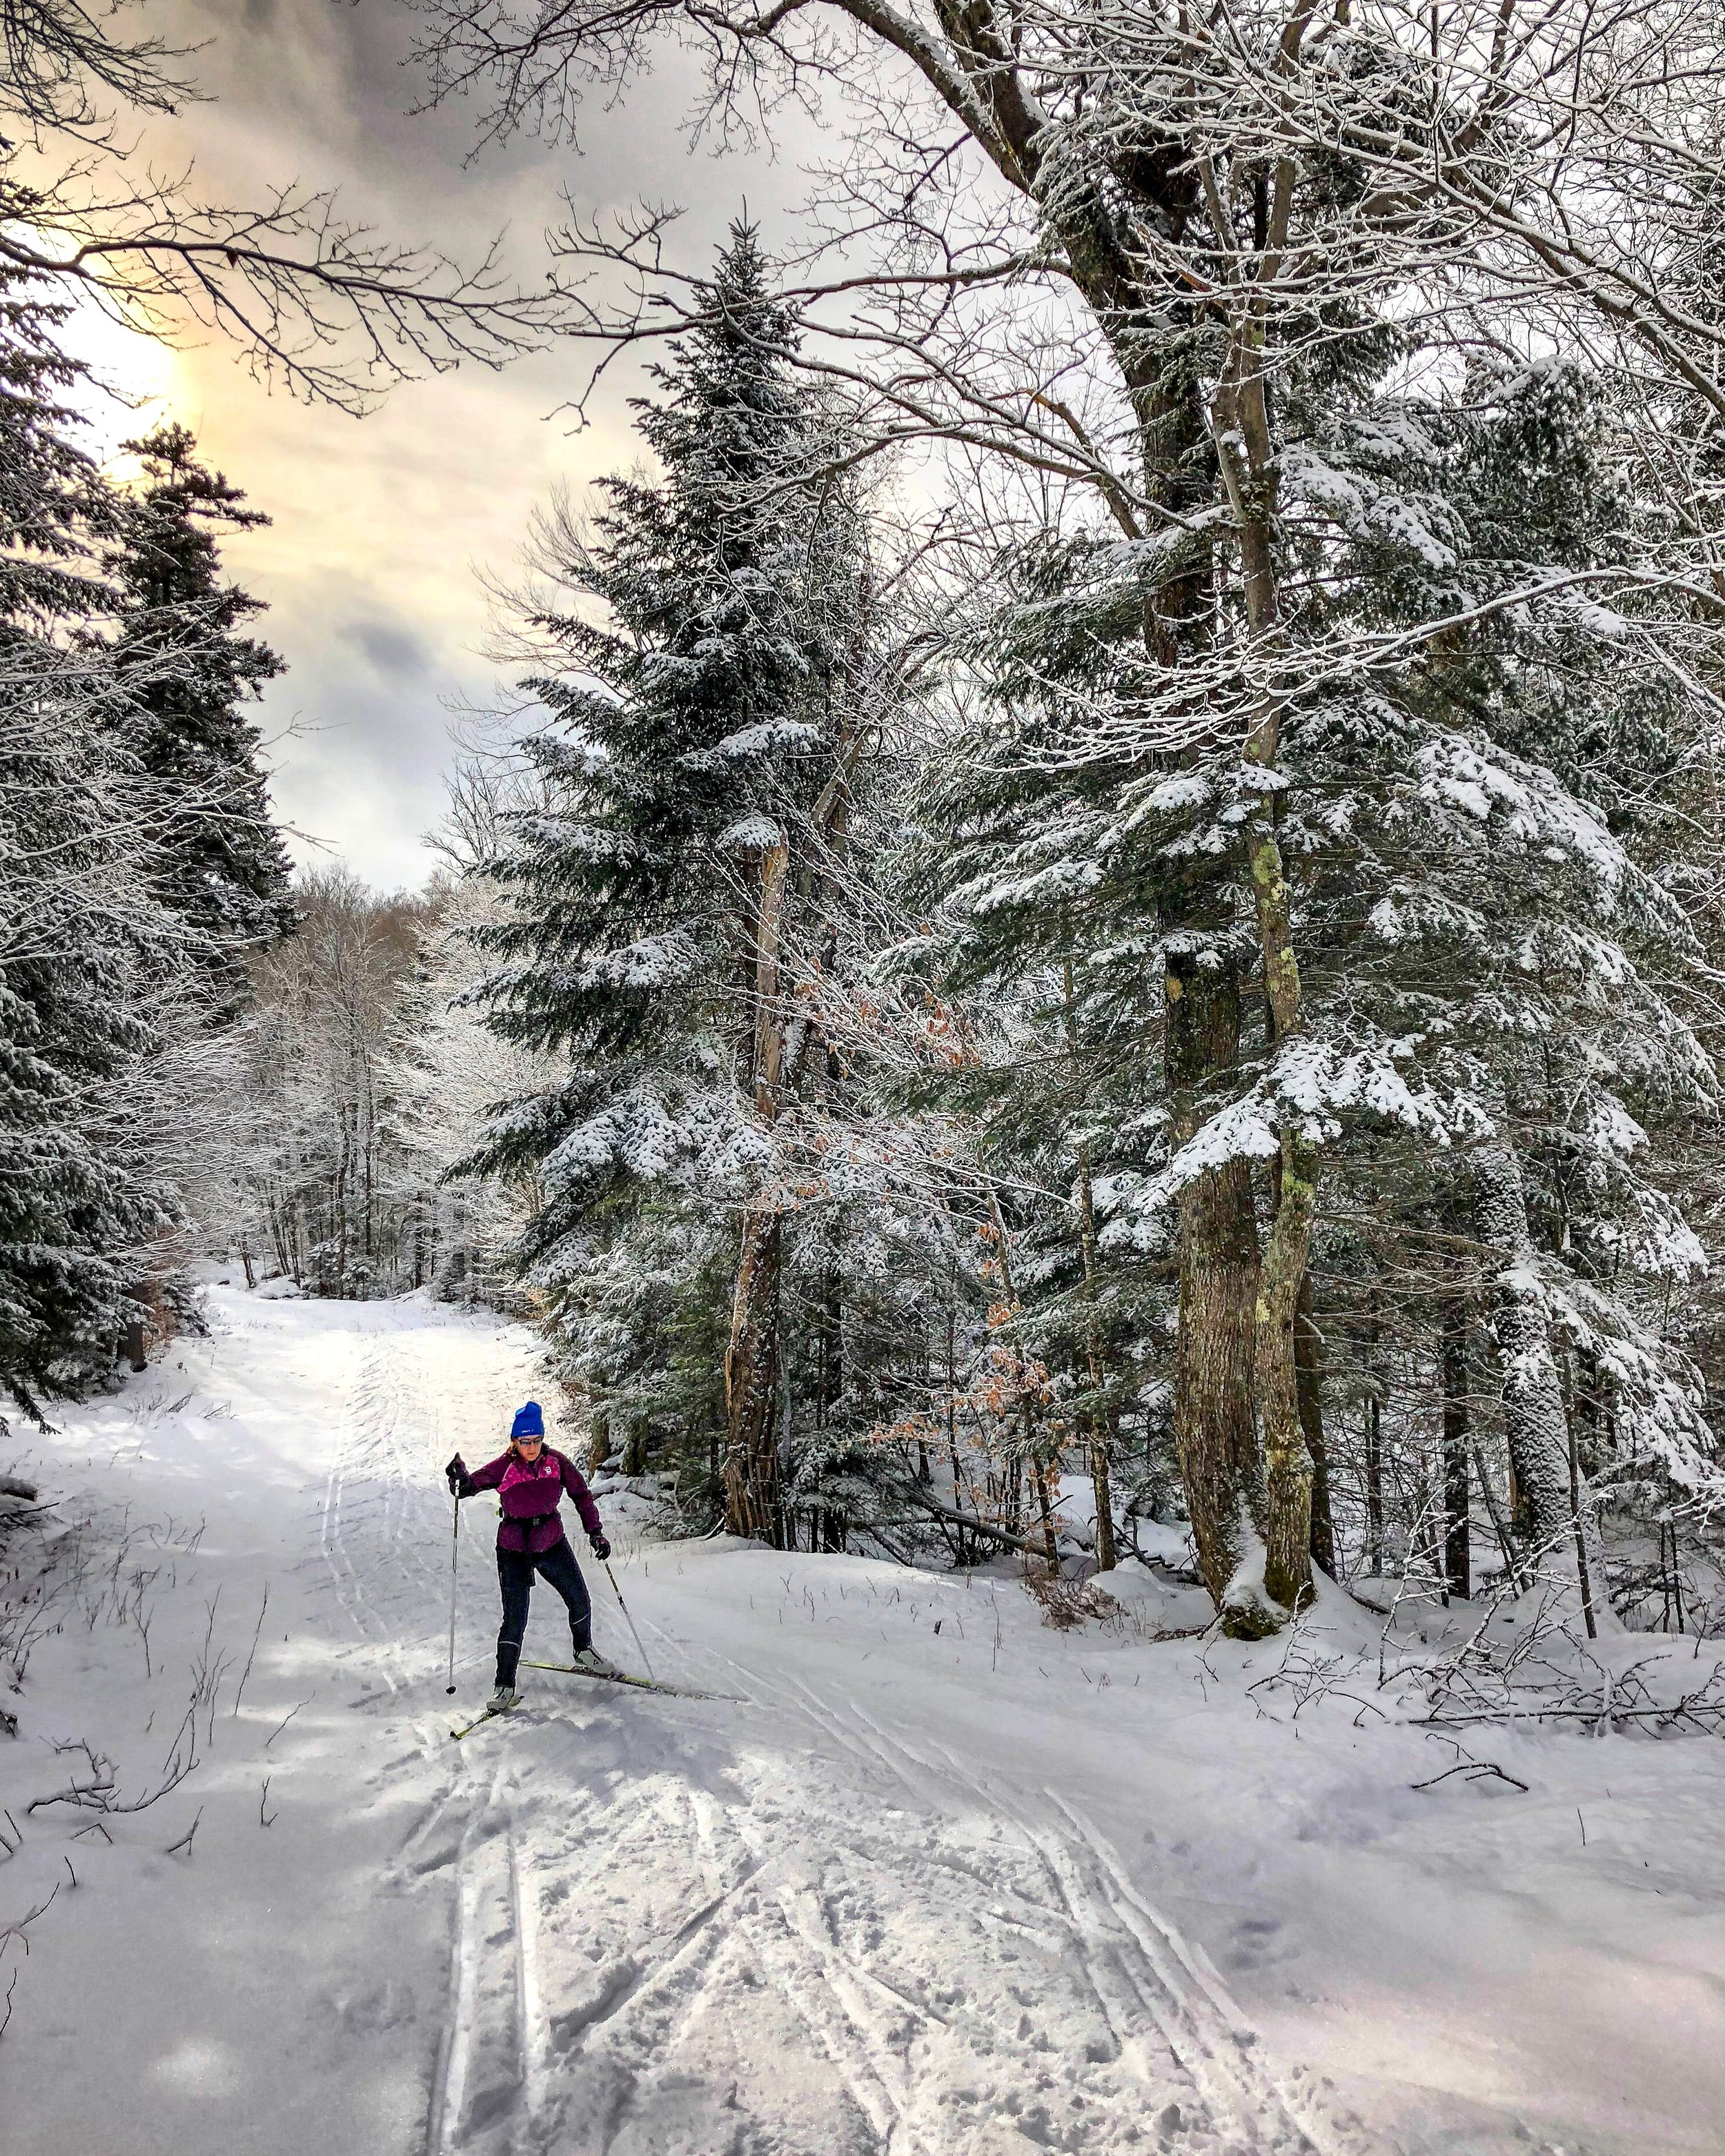 ski cross country.jpg